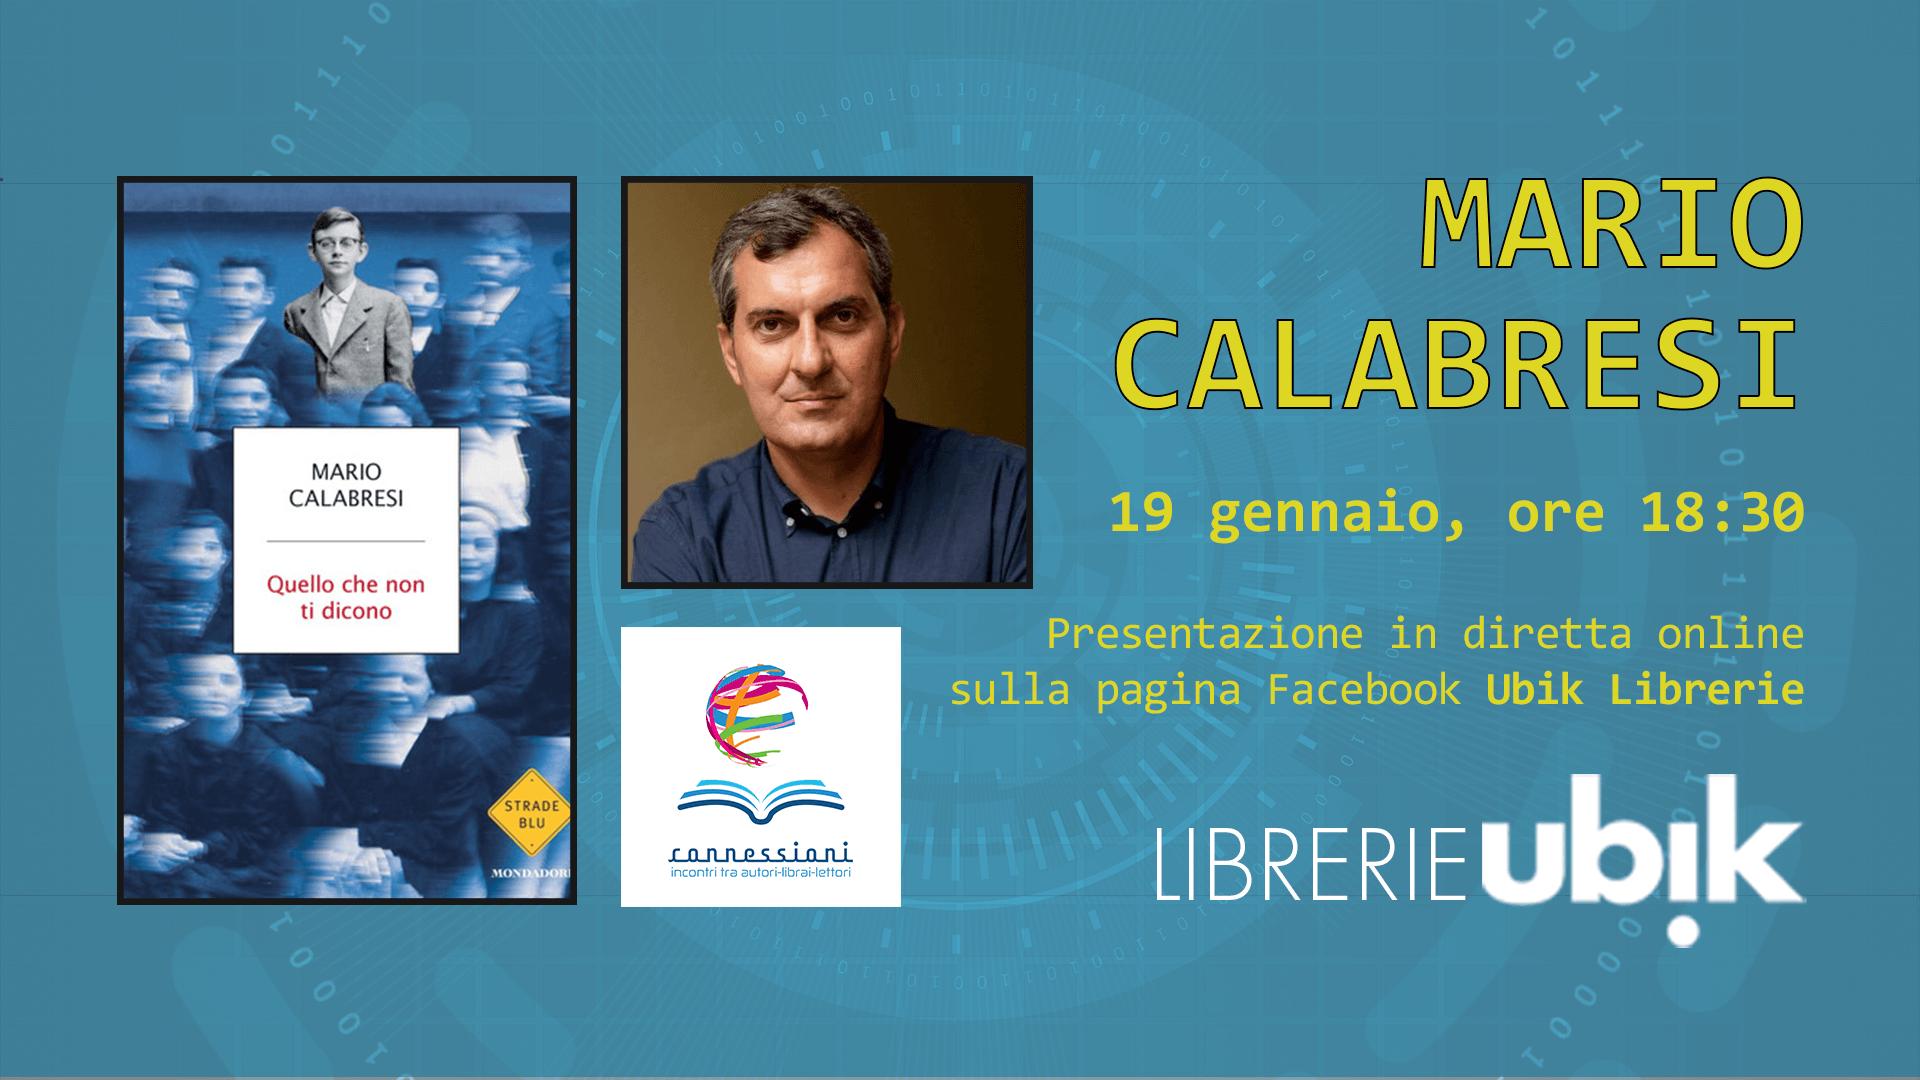 MARIO CALABRESI presenta in diretta online